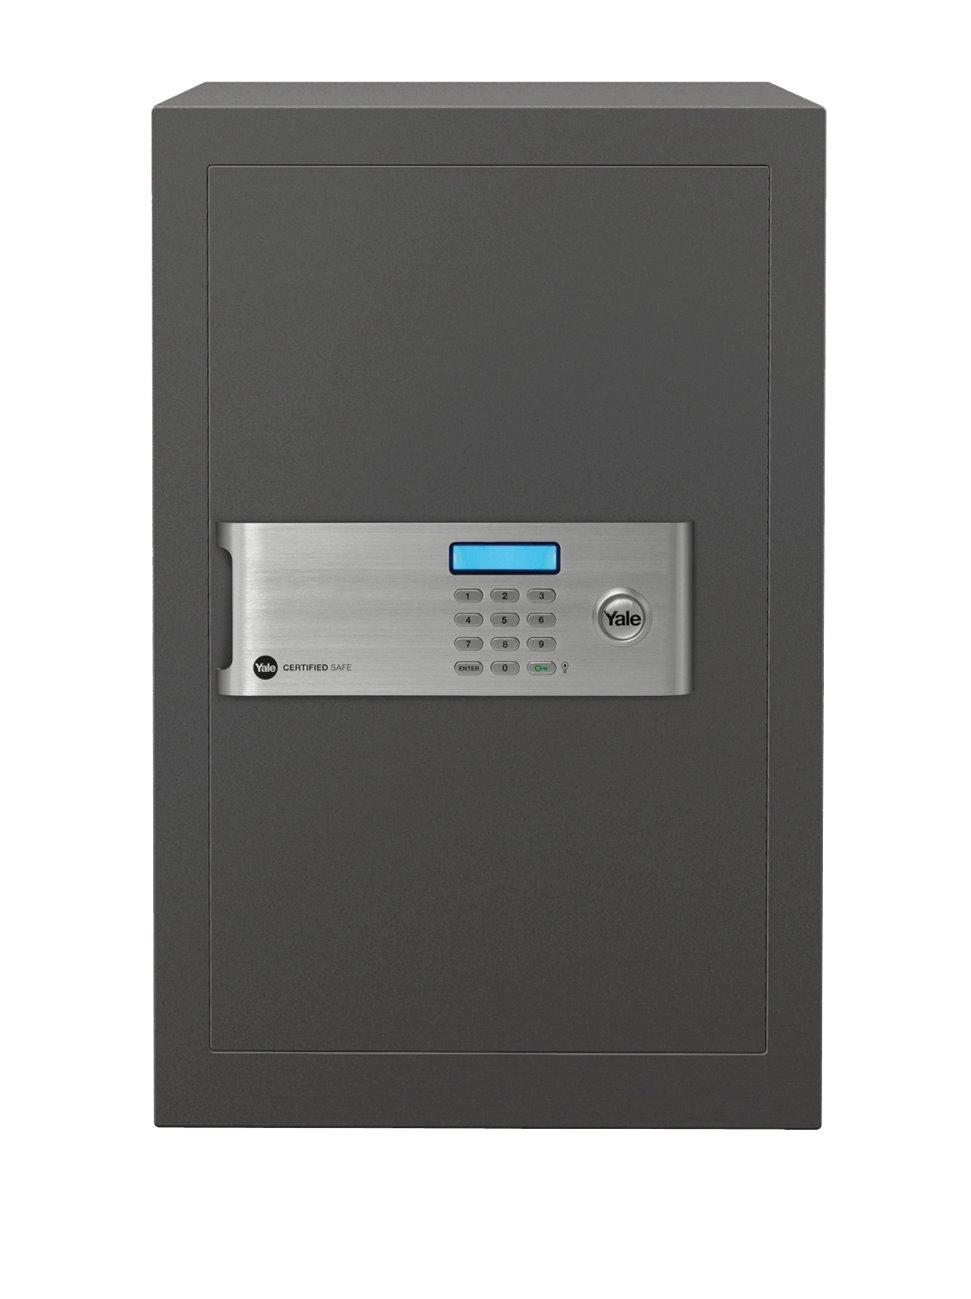 YSM/520/EG1 - Wzmocniony sejf  professional